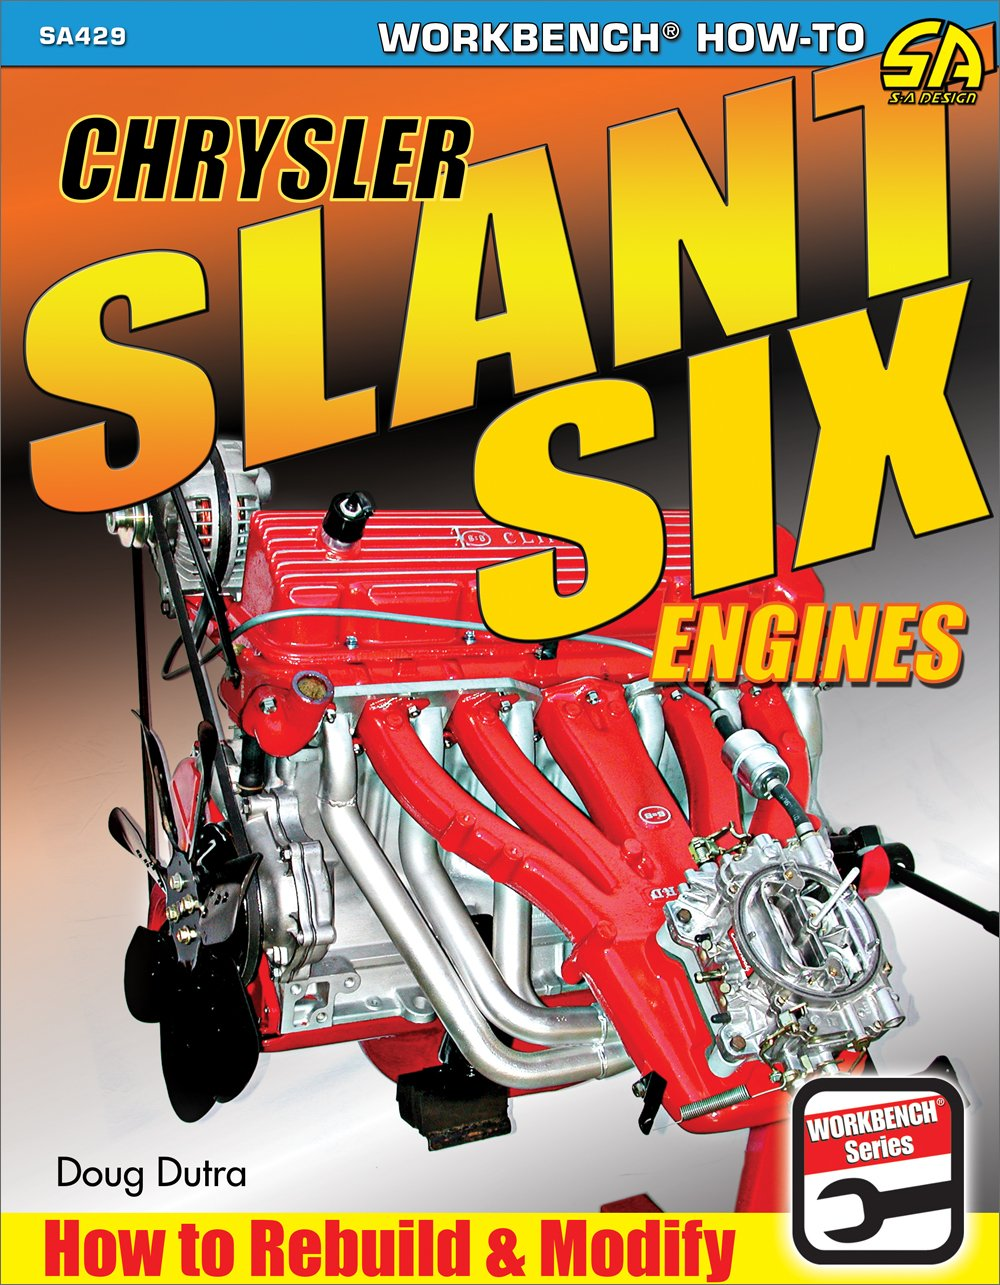 Chrysler Slant Six Engines 170 198 225 How To Rebuild Modify Service Manual Book